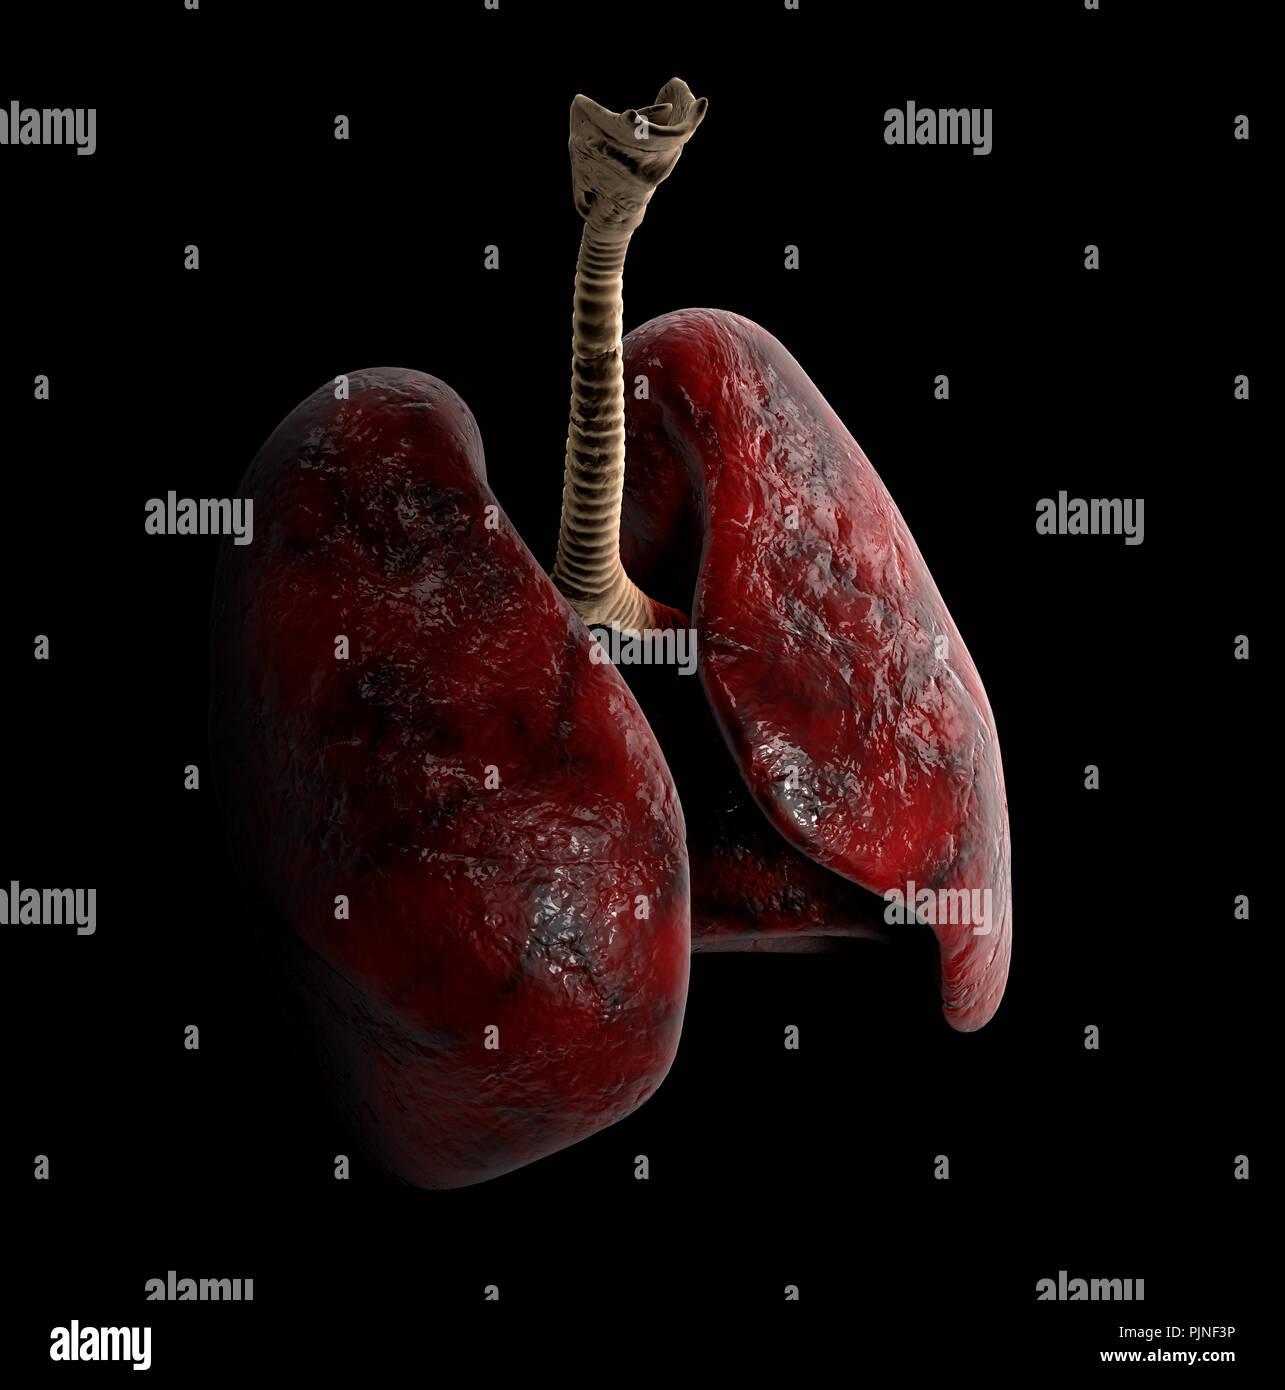 Human Lung anatomy, 3d Illustration on black background - Stock Image